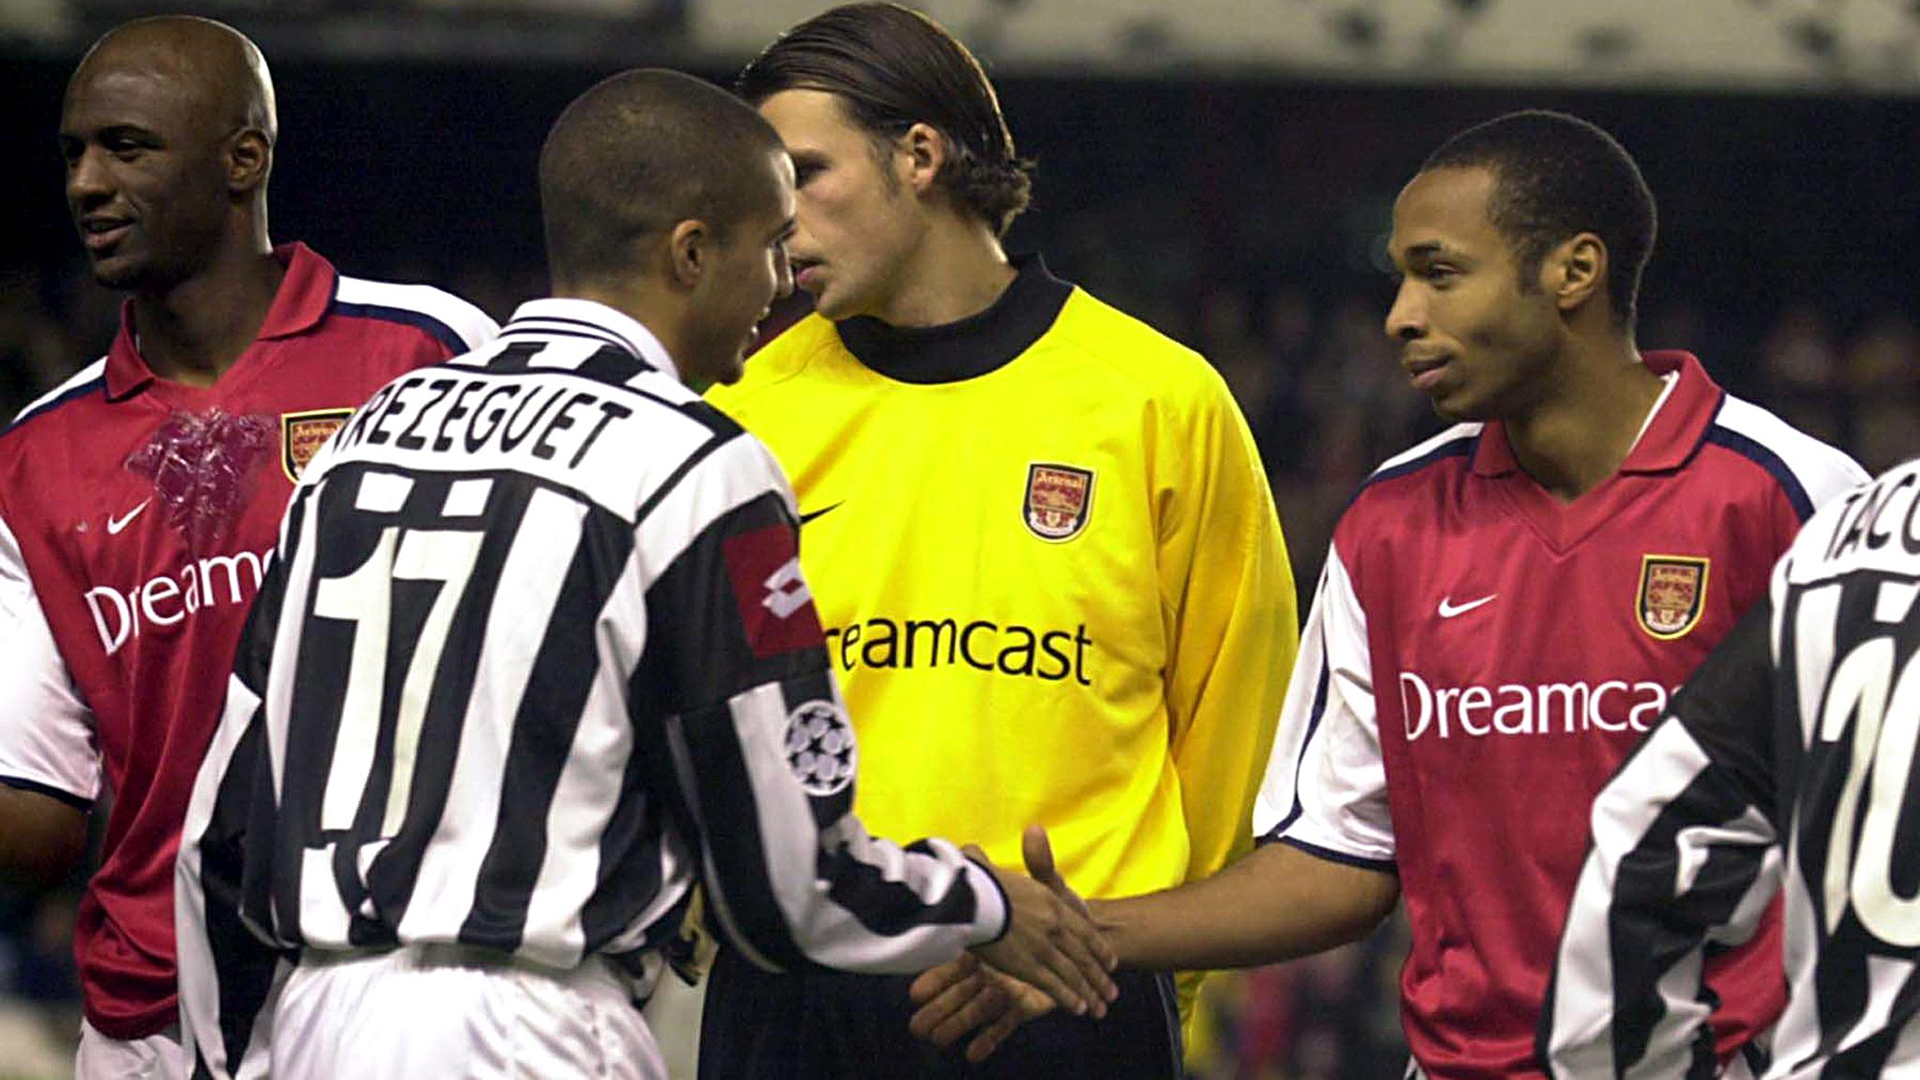 Thierry Henry David Trezeguet Arsenal Juventus